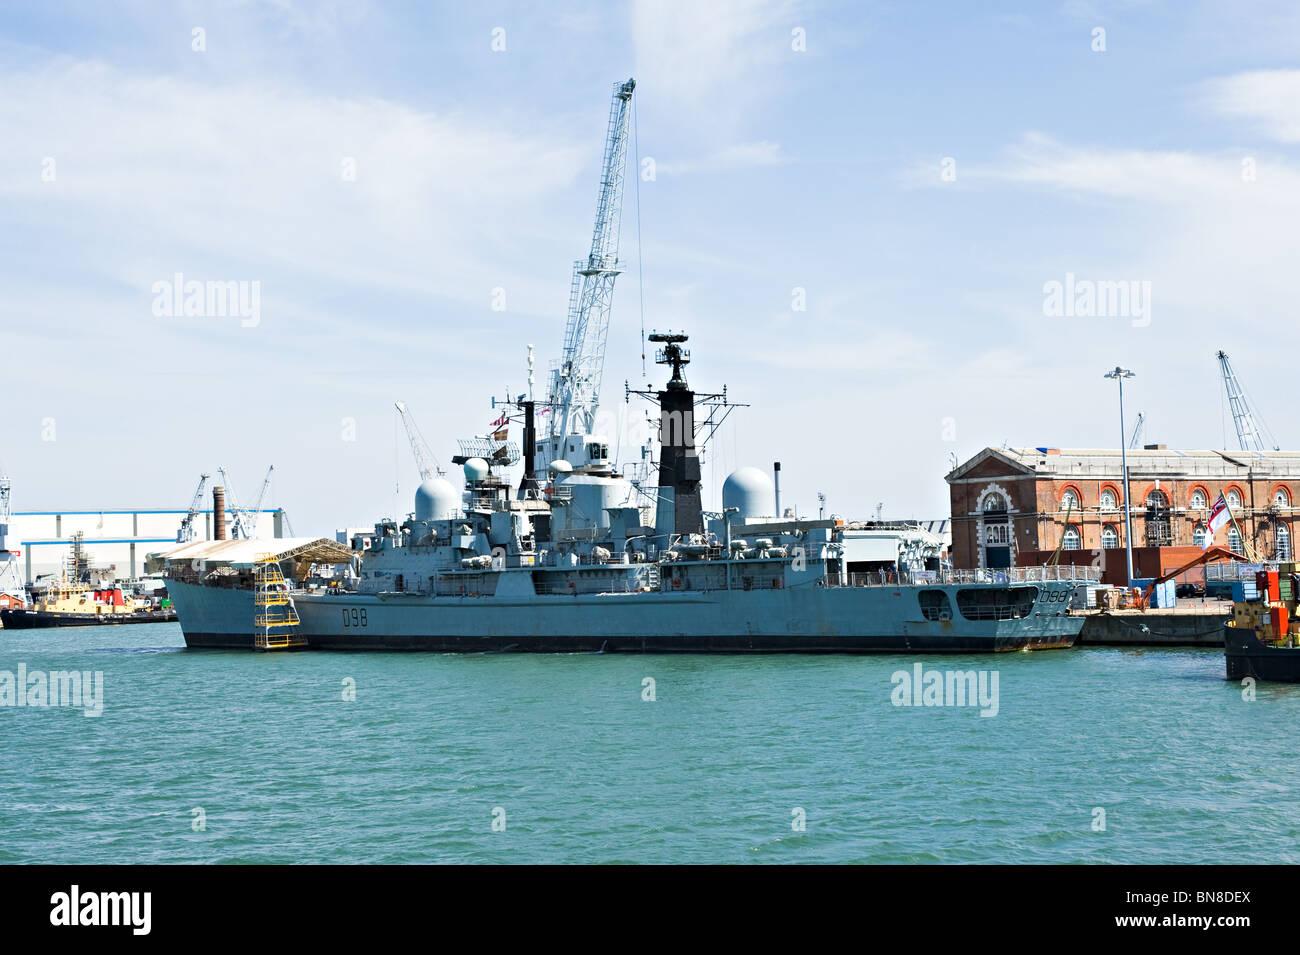 Royal Navy Type 42 Sheffield Class Destroyer HMS York D98 Docked at Portsmouth Naval Dockyard England UK - Stock Image